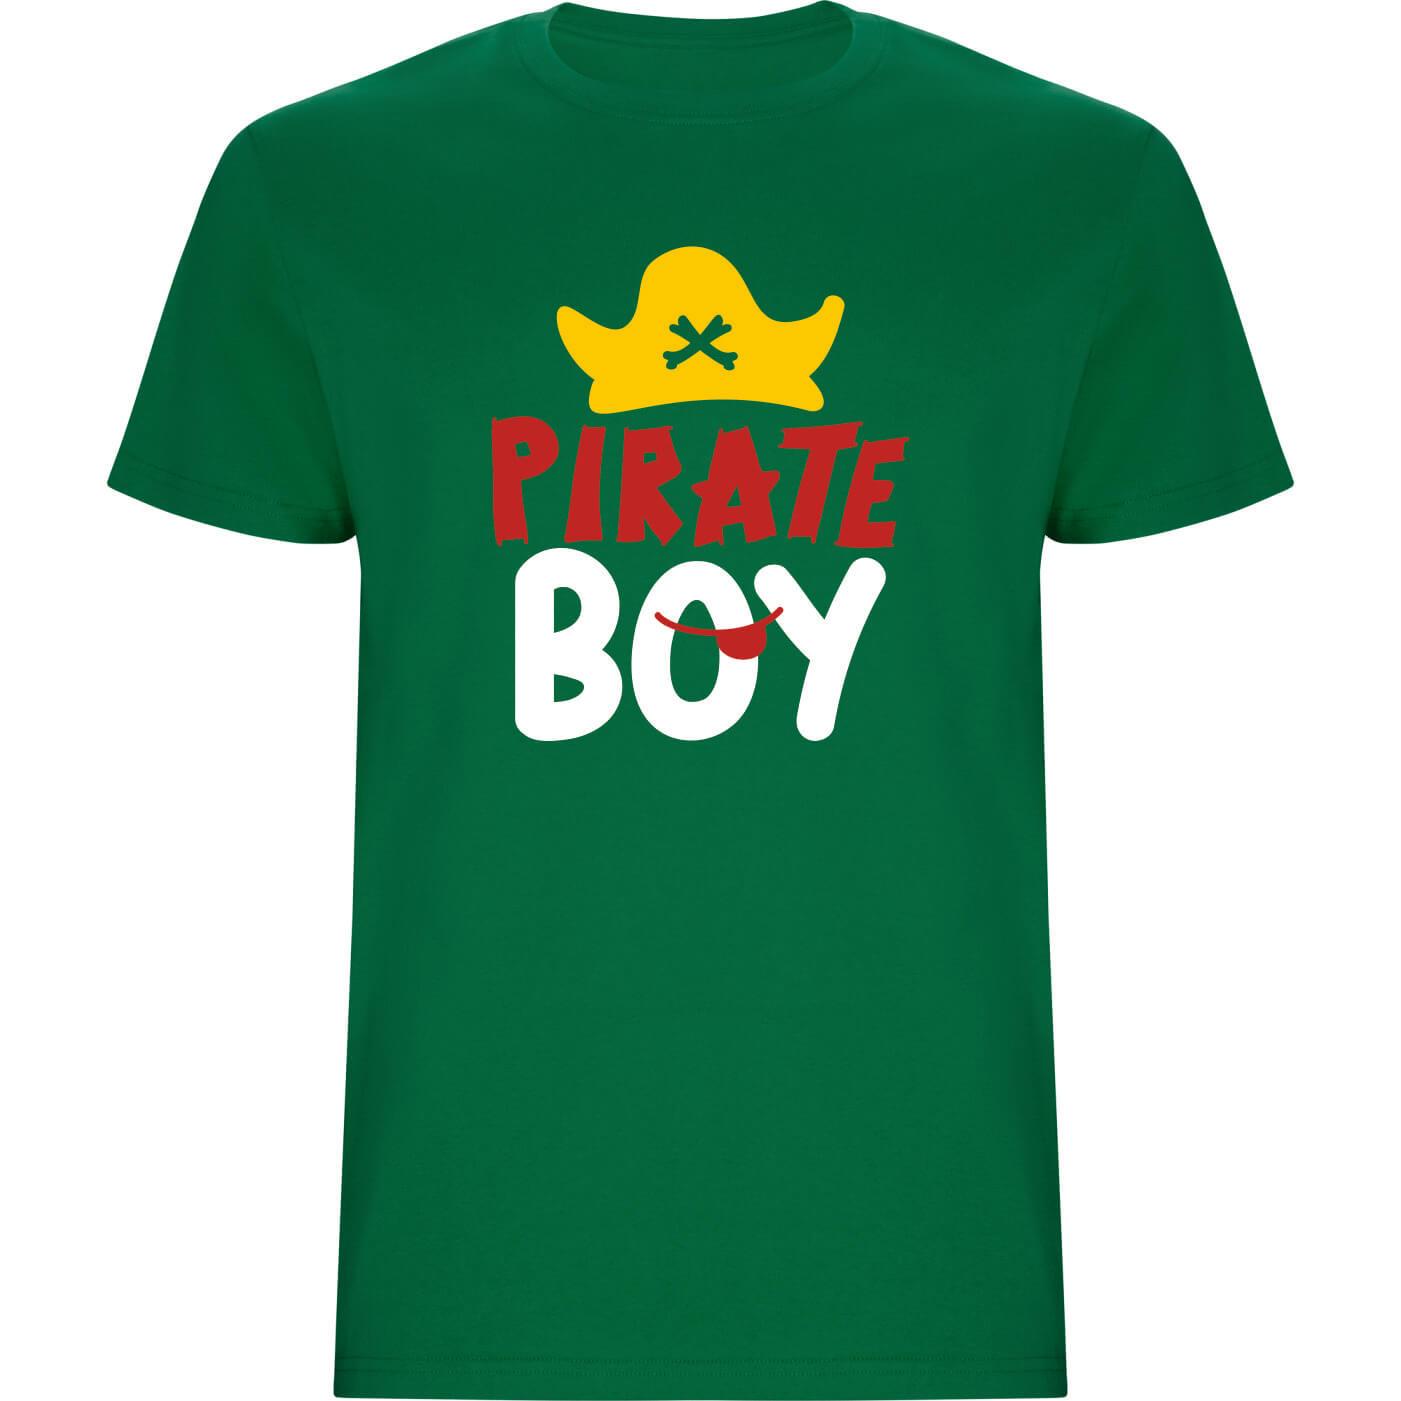 Camiseta de niño pirate boy verde grass